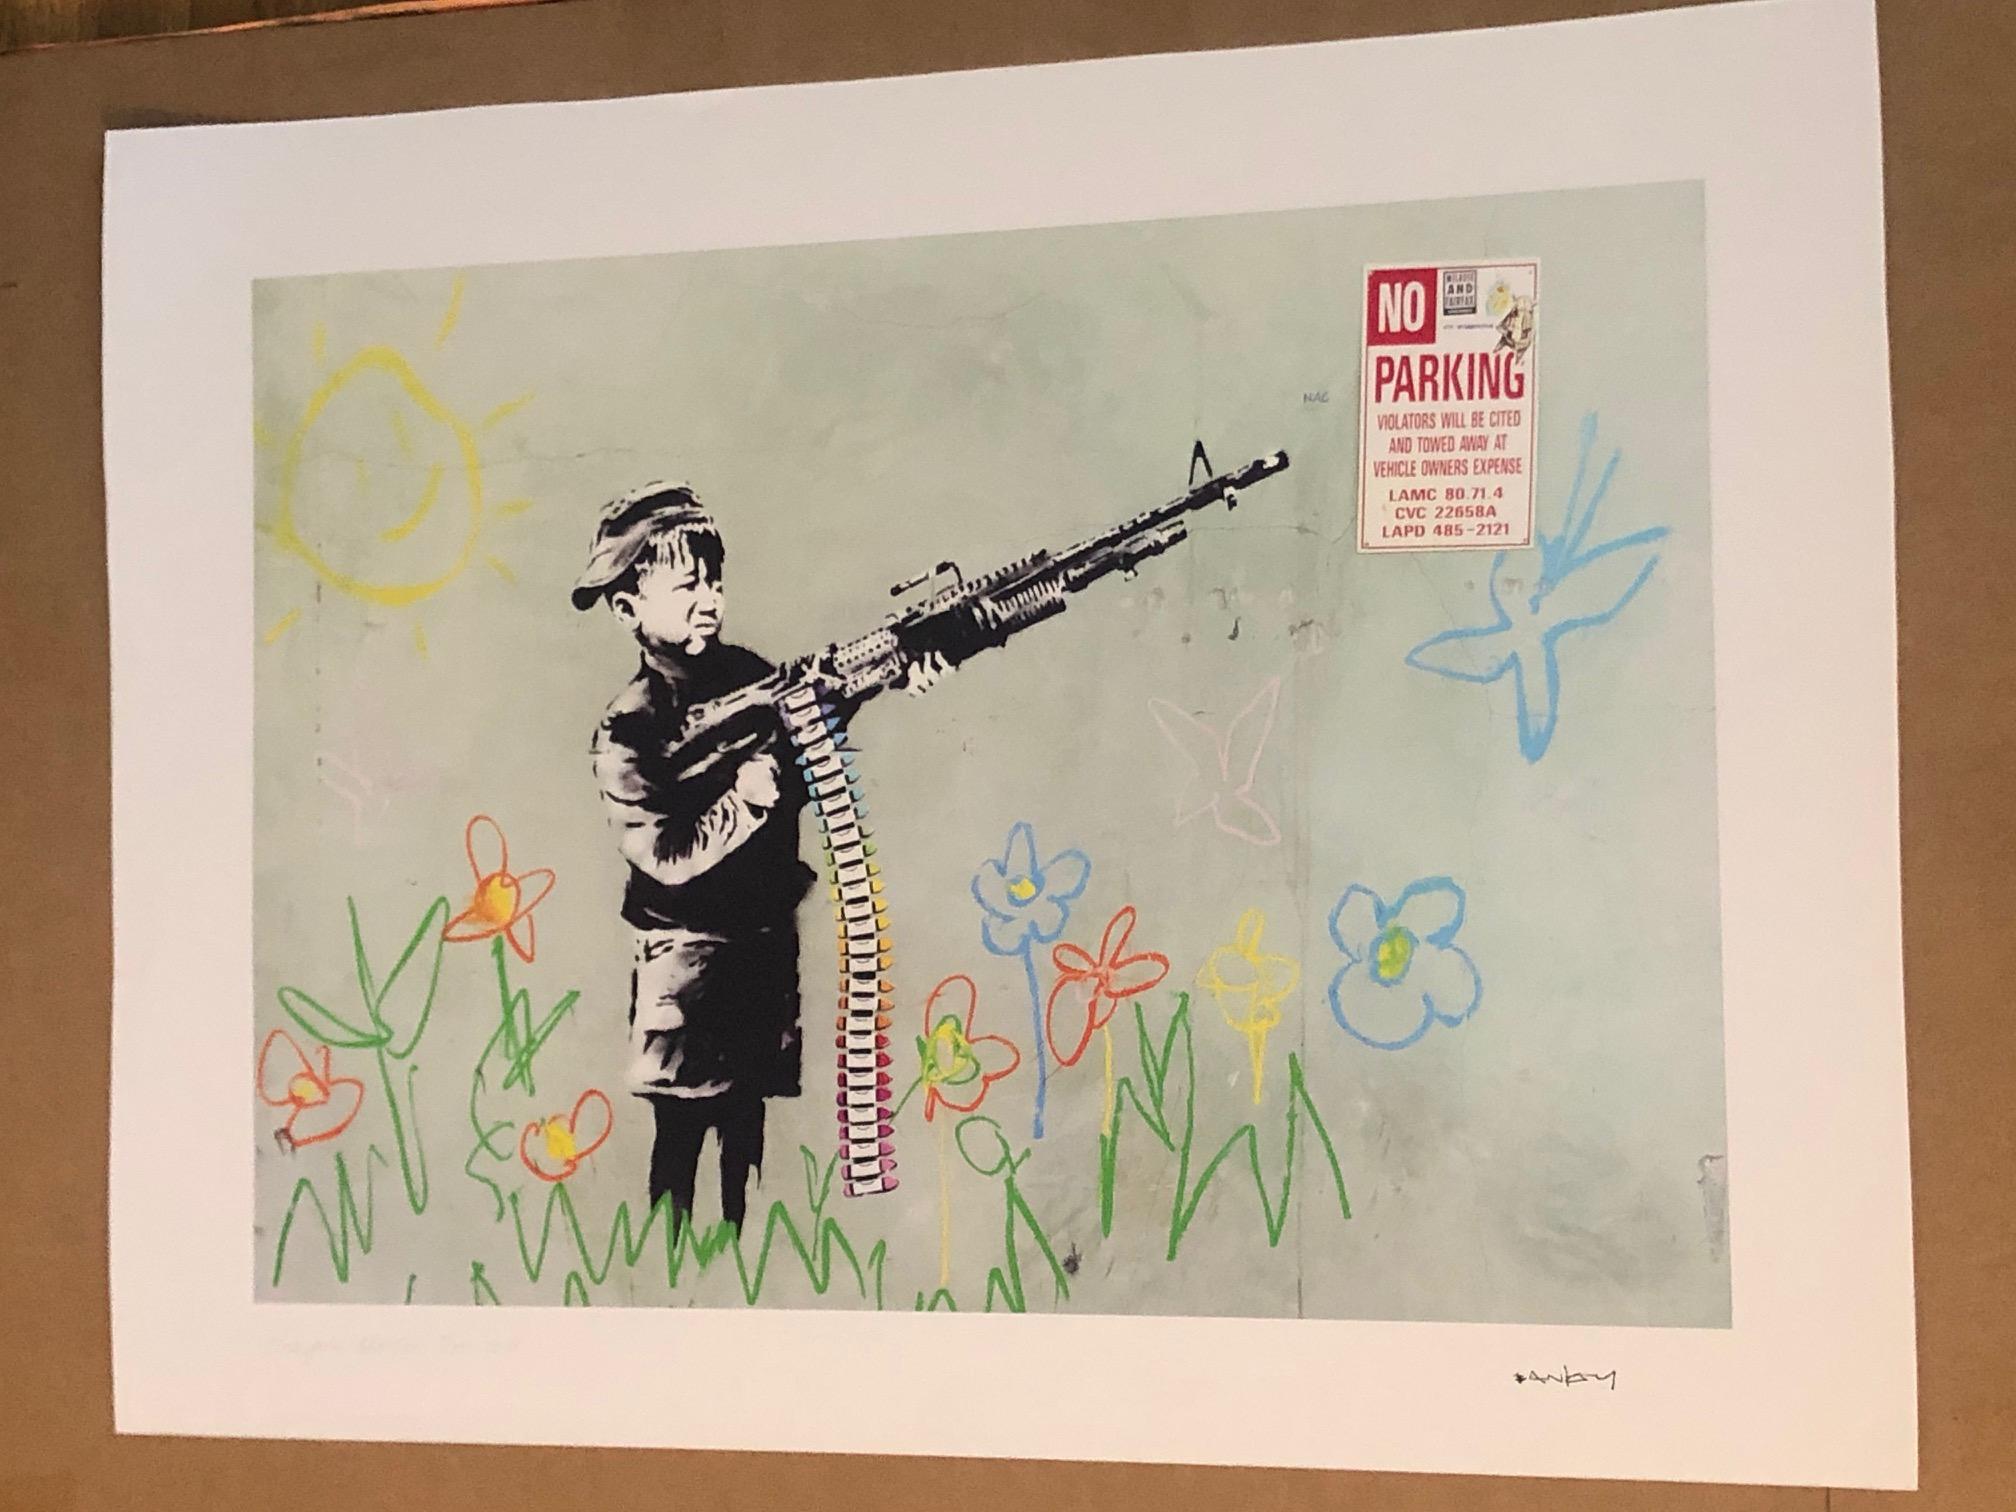 Crayola Shooter by   Banksy - Masterpiece Online